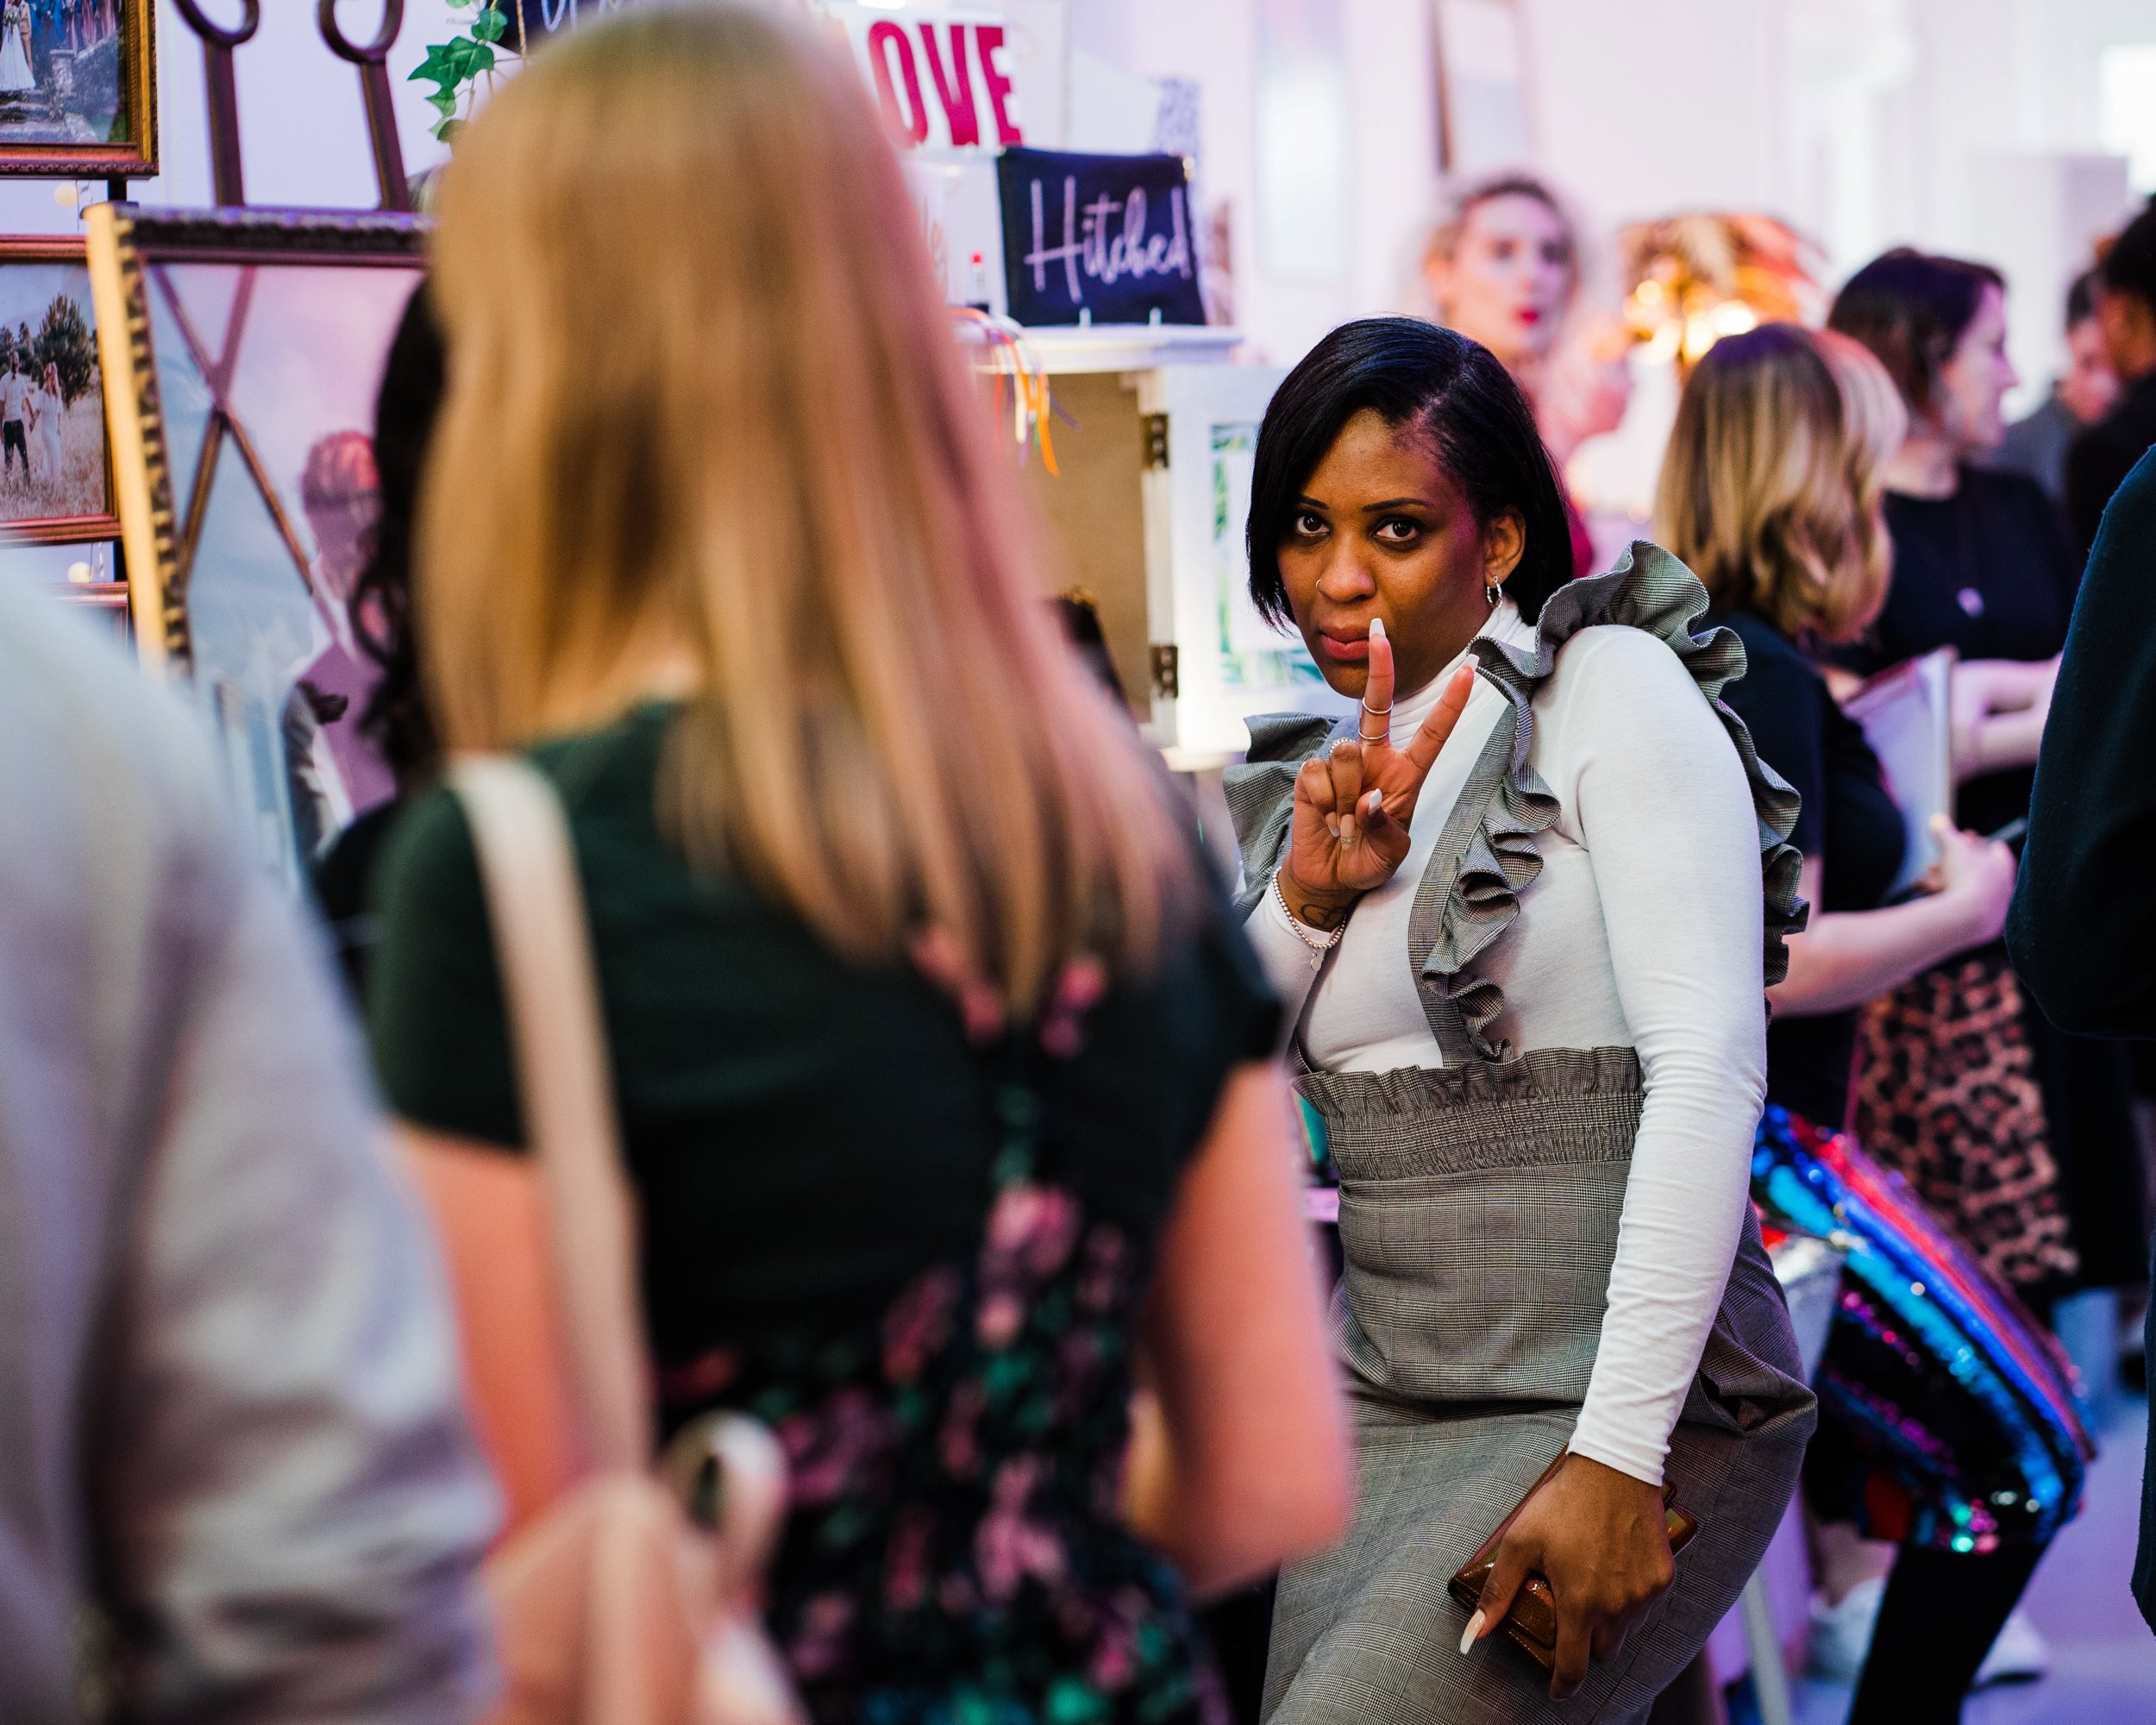 The UN-WEDDING SHOW 2019 cool bride style modern wedding fair London Core Clapton 00005.jpg